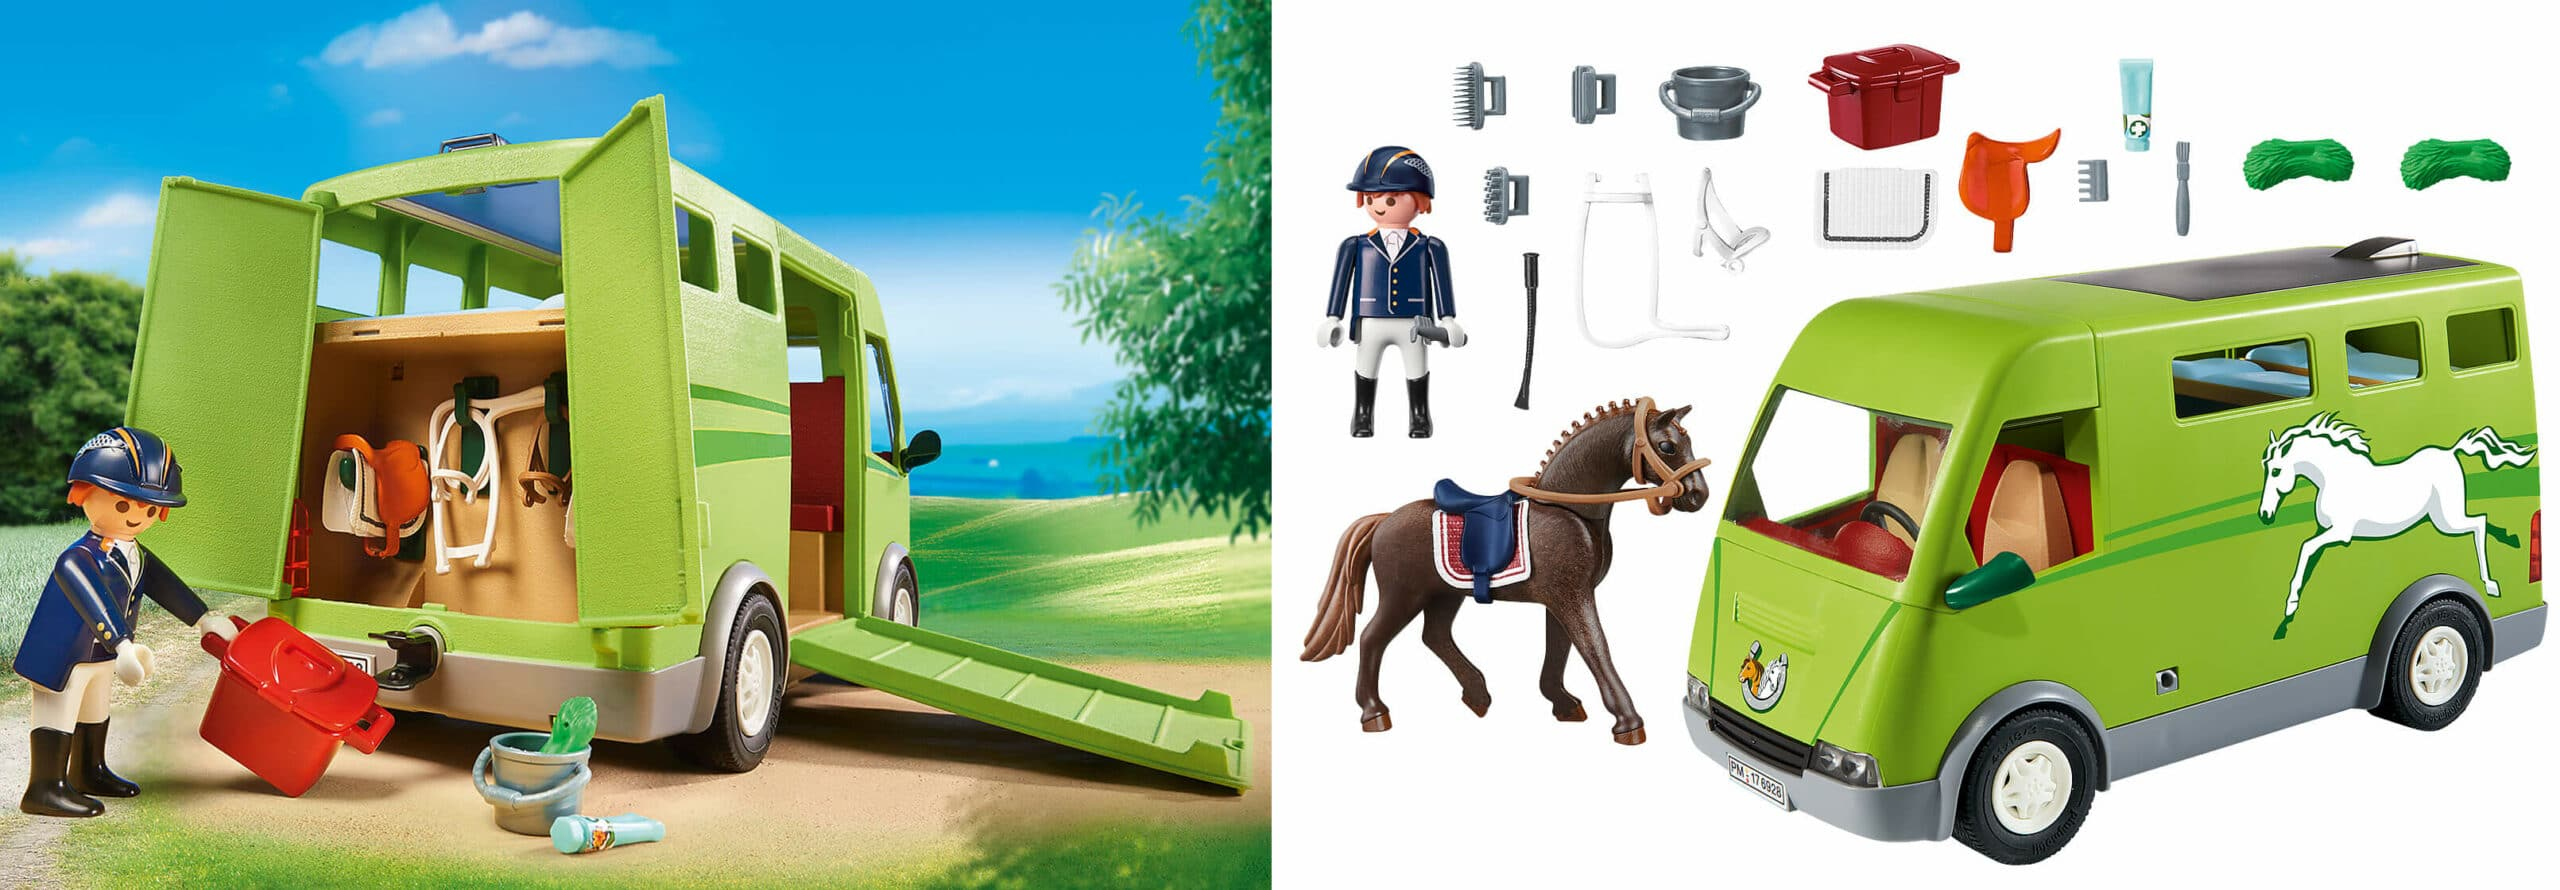 Playmobil Pferdetransporter: Günstiges Mädchenset